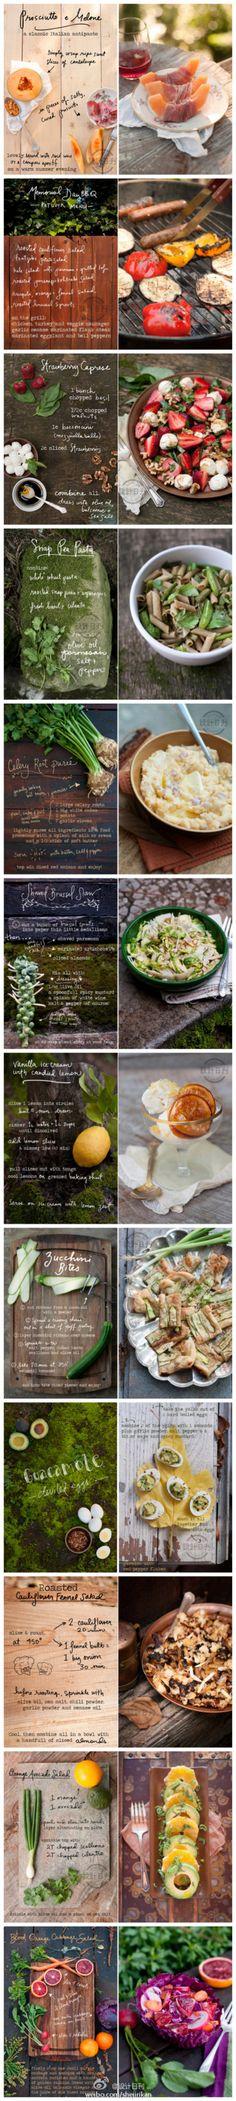 Erin Gleeson开设了一个叫 'The Forest Feast'的博客,她把美食照片作为背景图片,手写食谱于上。这些食谱的排版方式非常清新可人。(